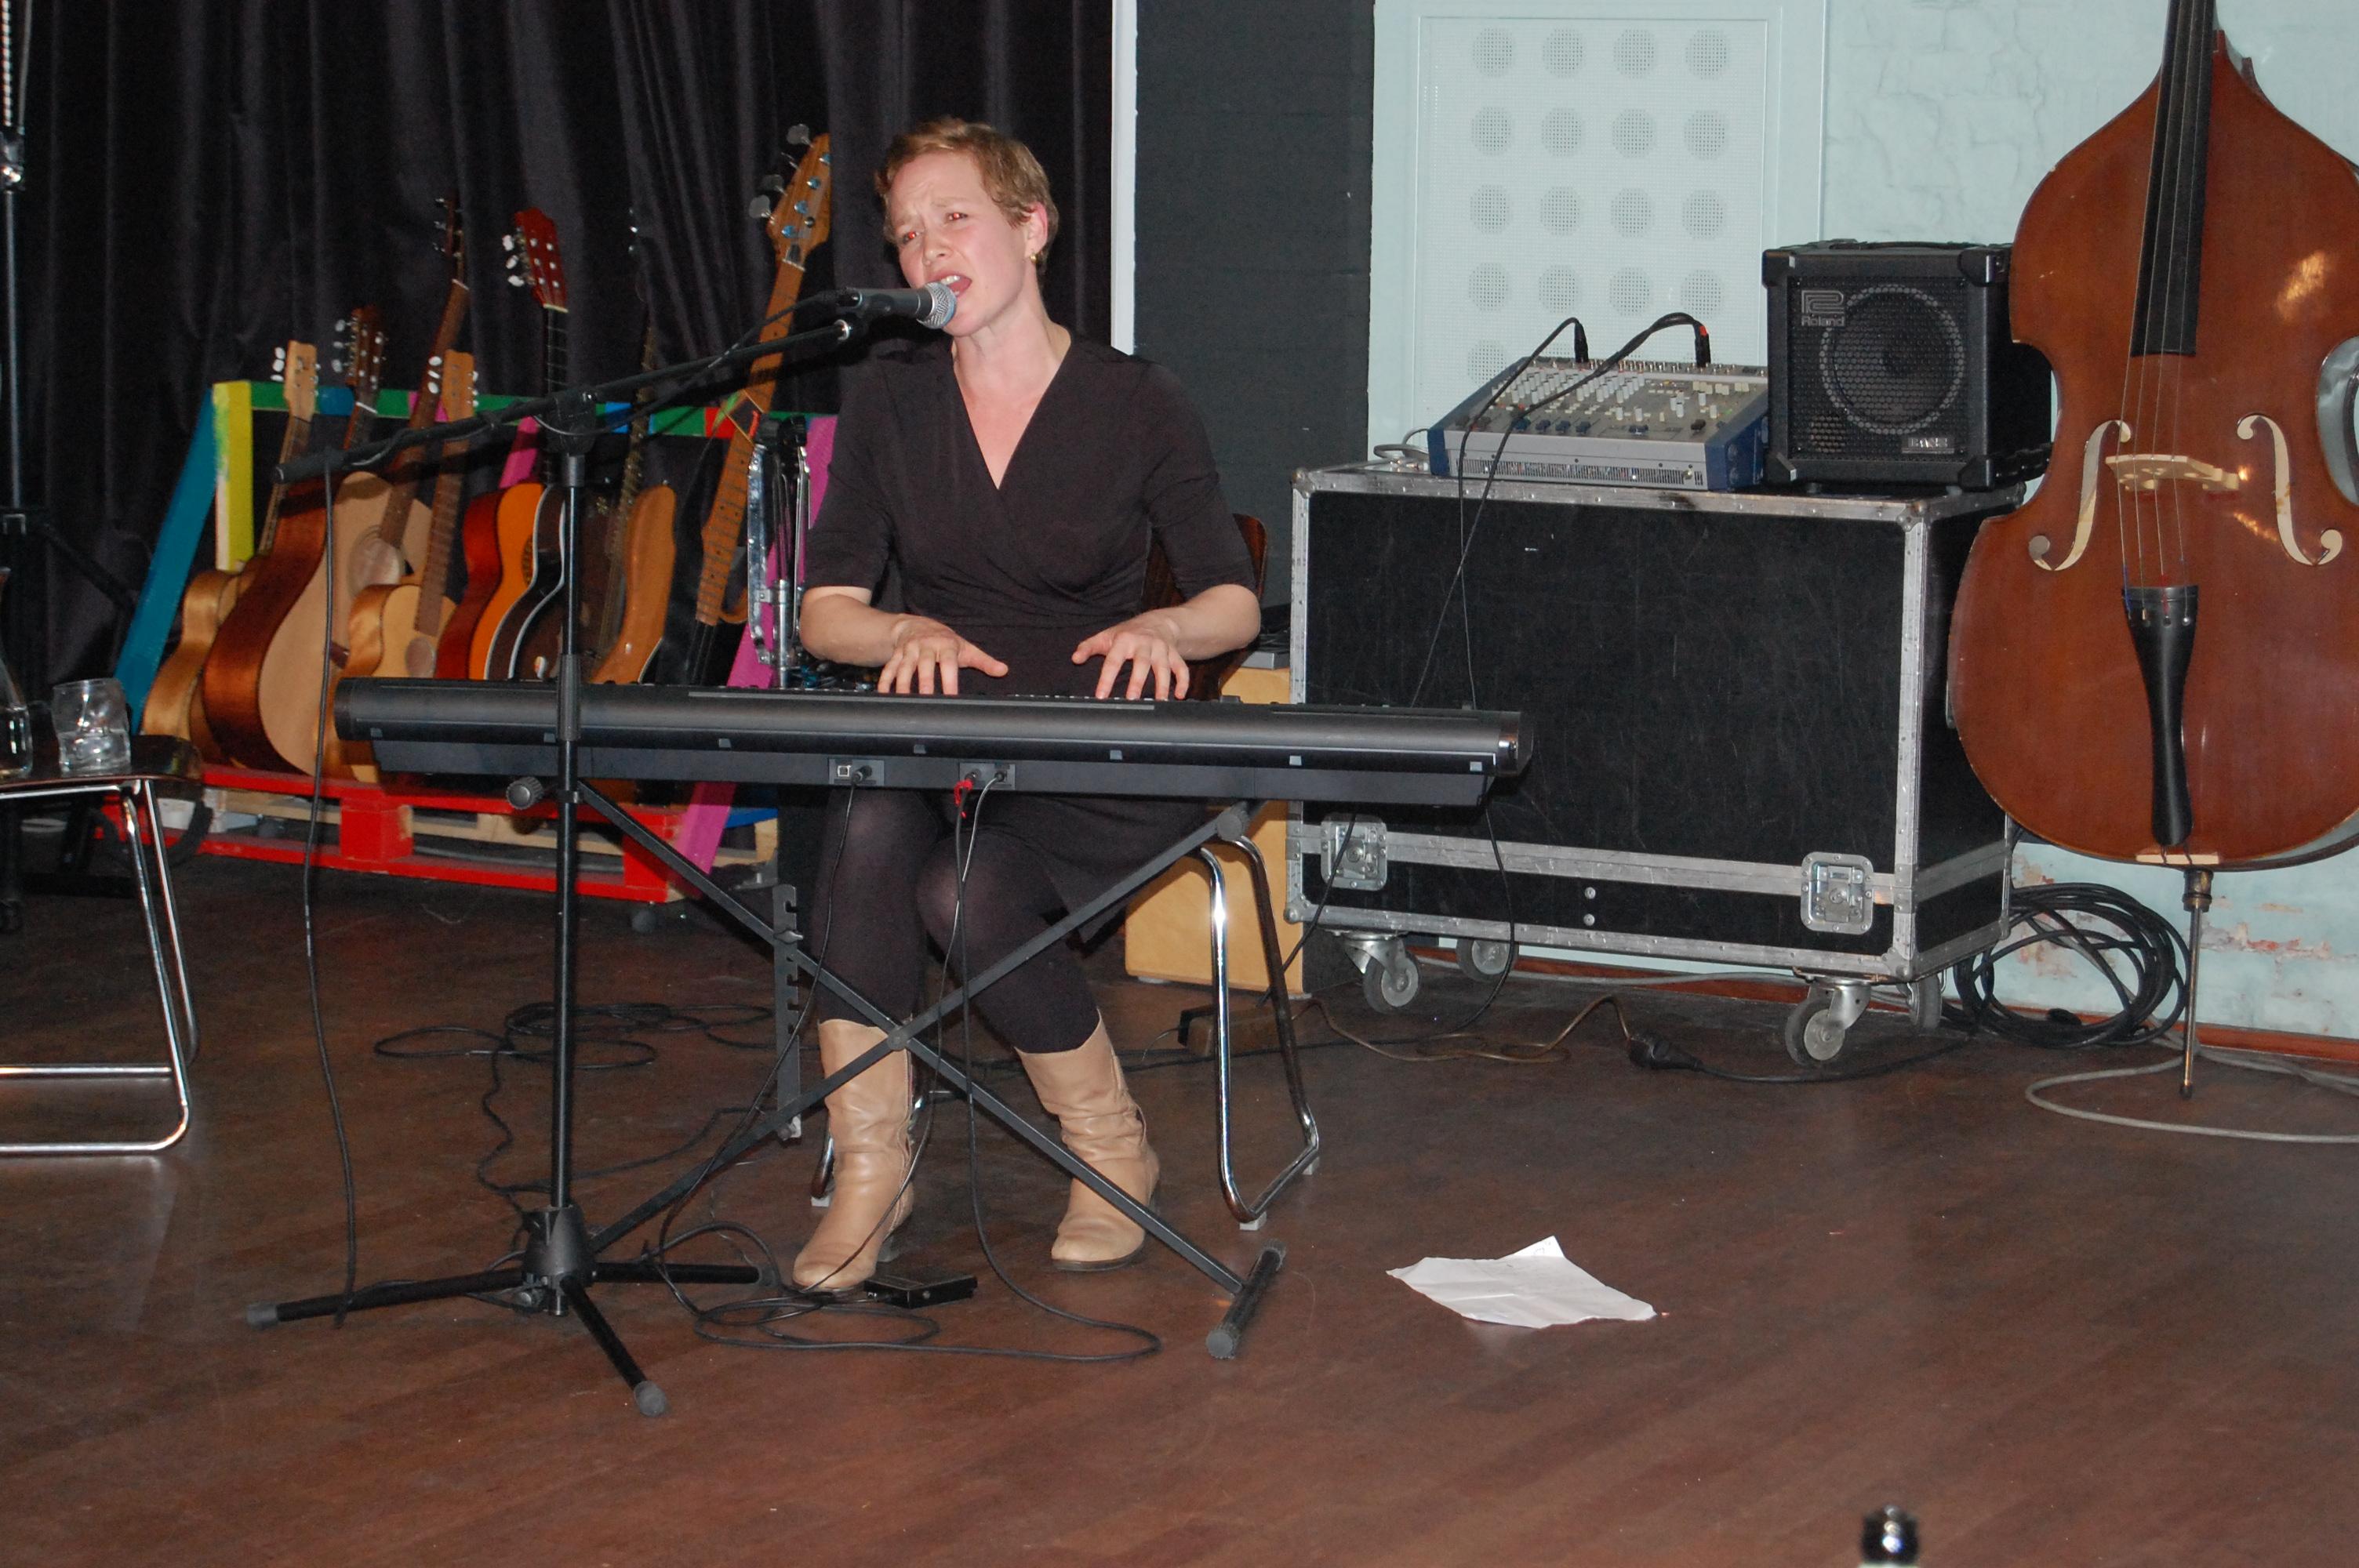 2019-09-21 Konzert Amalia Chikh mosaique LG (9)